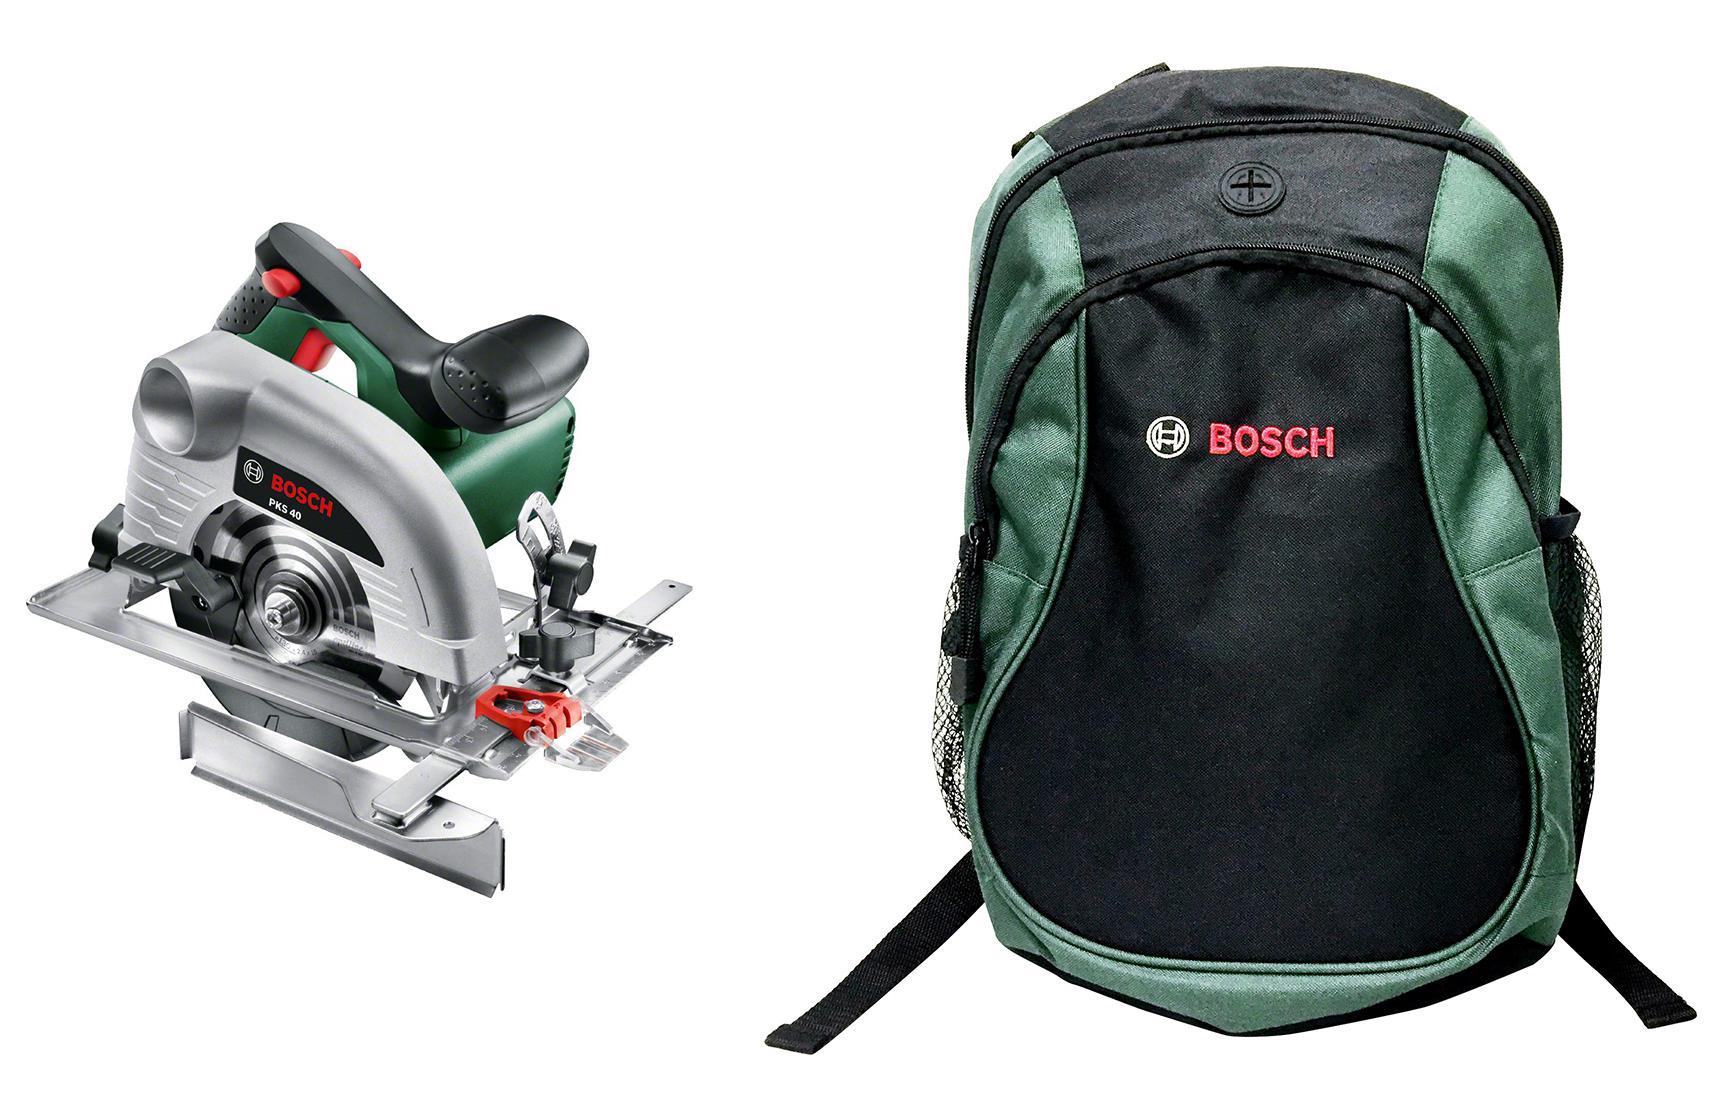 Набор Bosch Пила циркулярная pks 40 + рюкзак green (1619g45200) аккумуляторная циркулярная пила bosch gks 12v 26 professionali без акк и з у 0 601 6a1 001